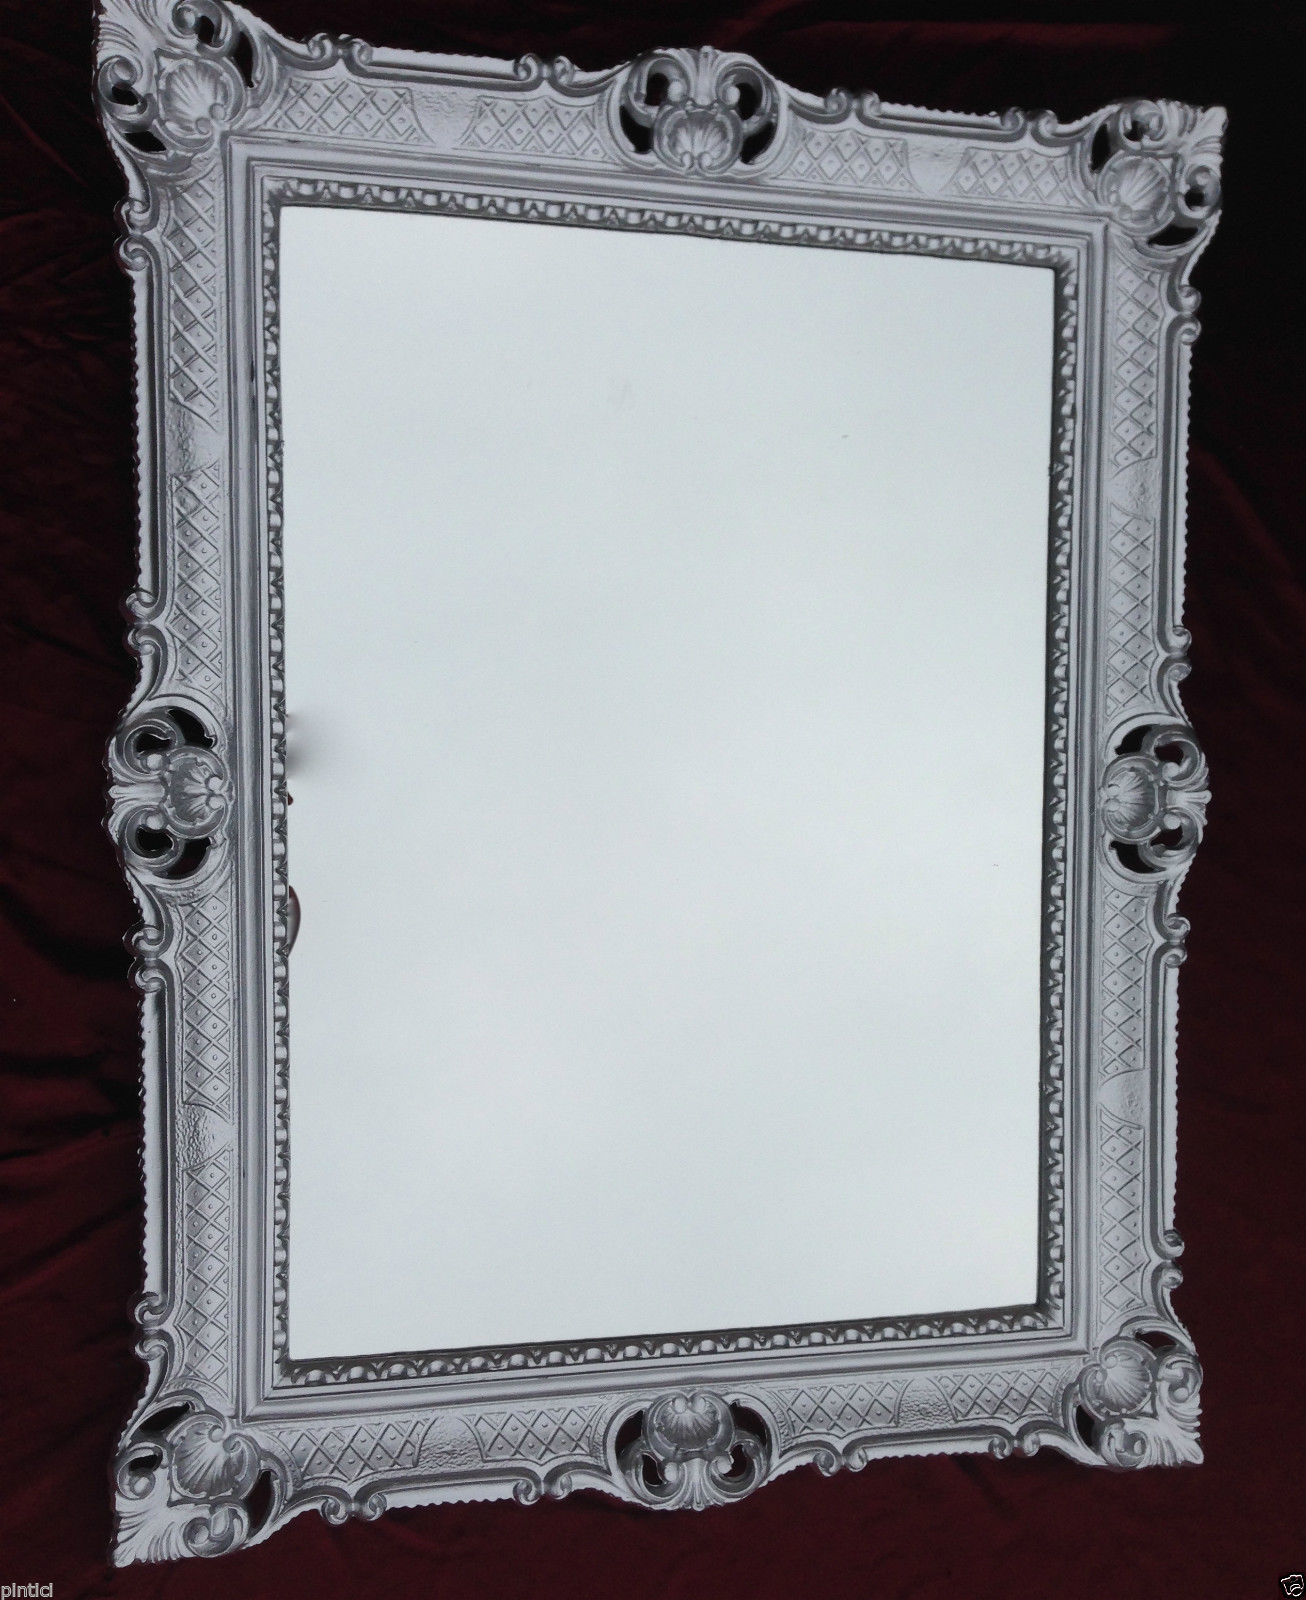 Bilderrahmen Silber REPRO 90x70 Gemälderahmen Barock Fotorahmen ...